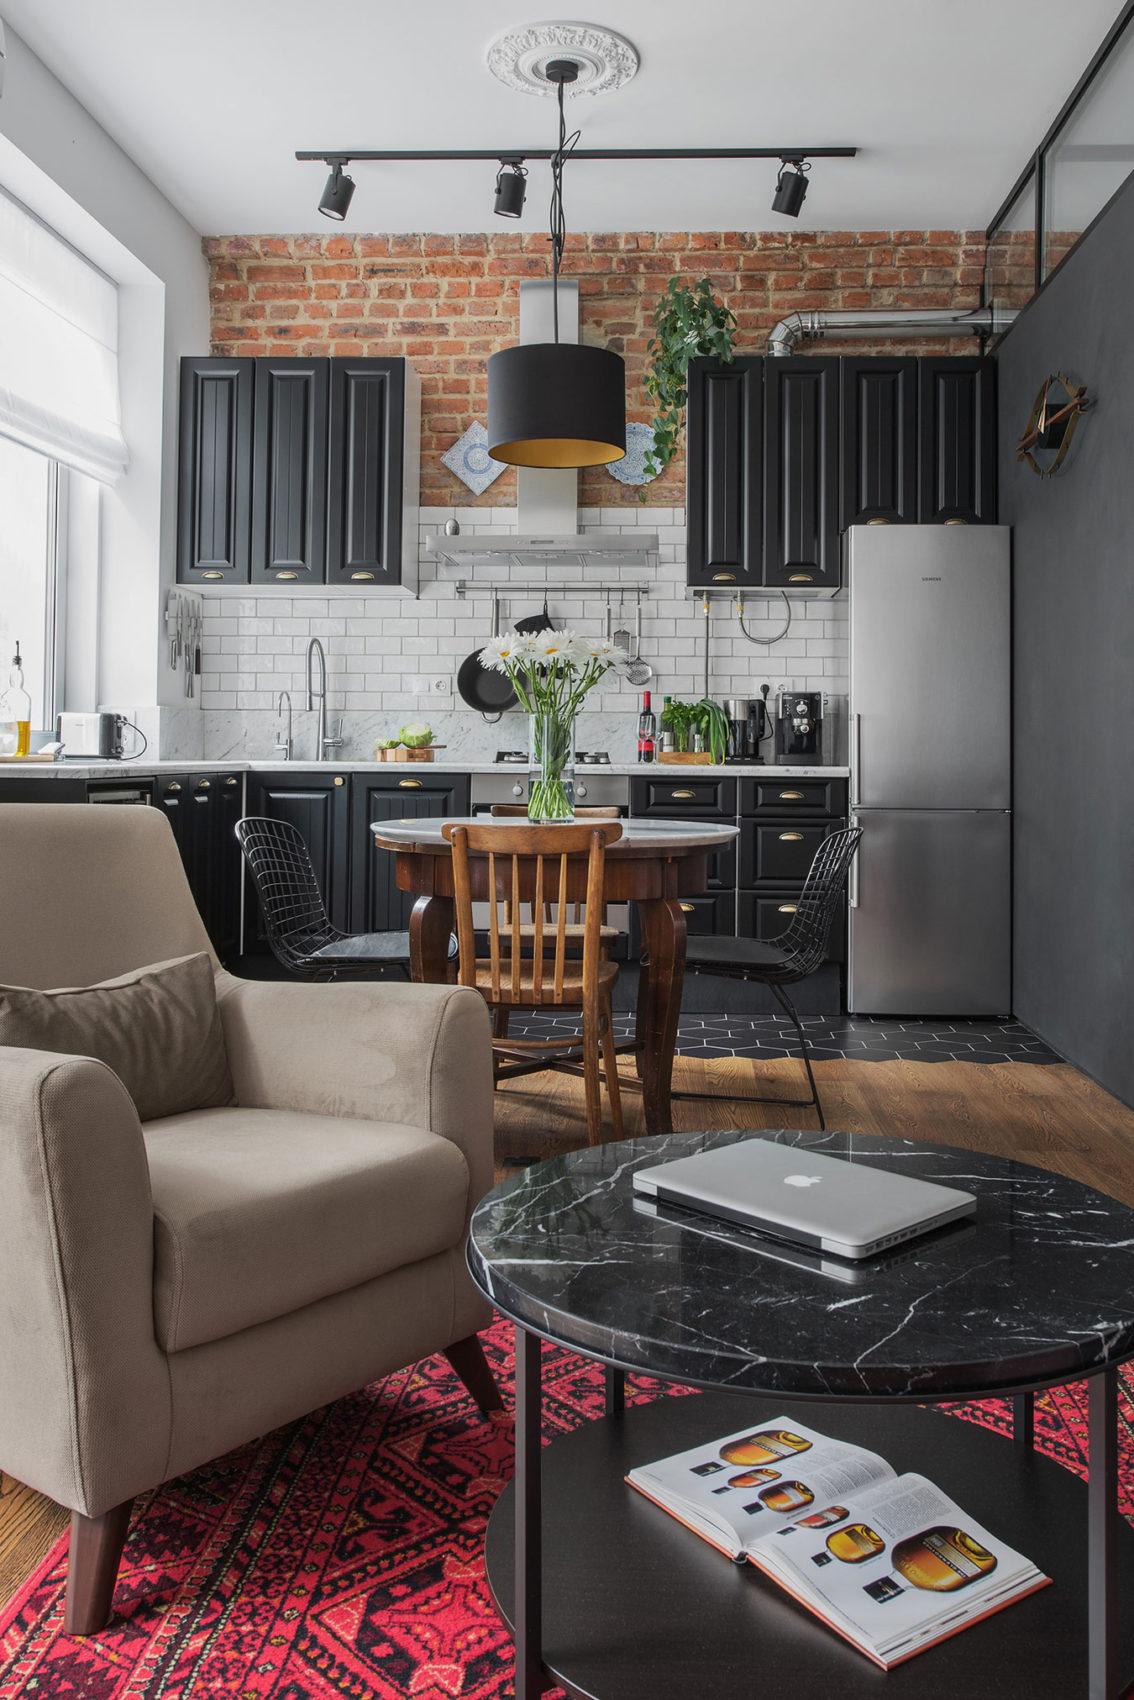 Интерьер небольшой, но стильной квартиры